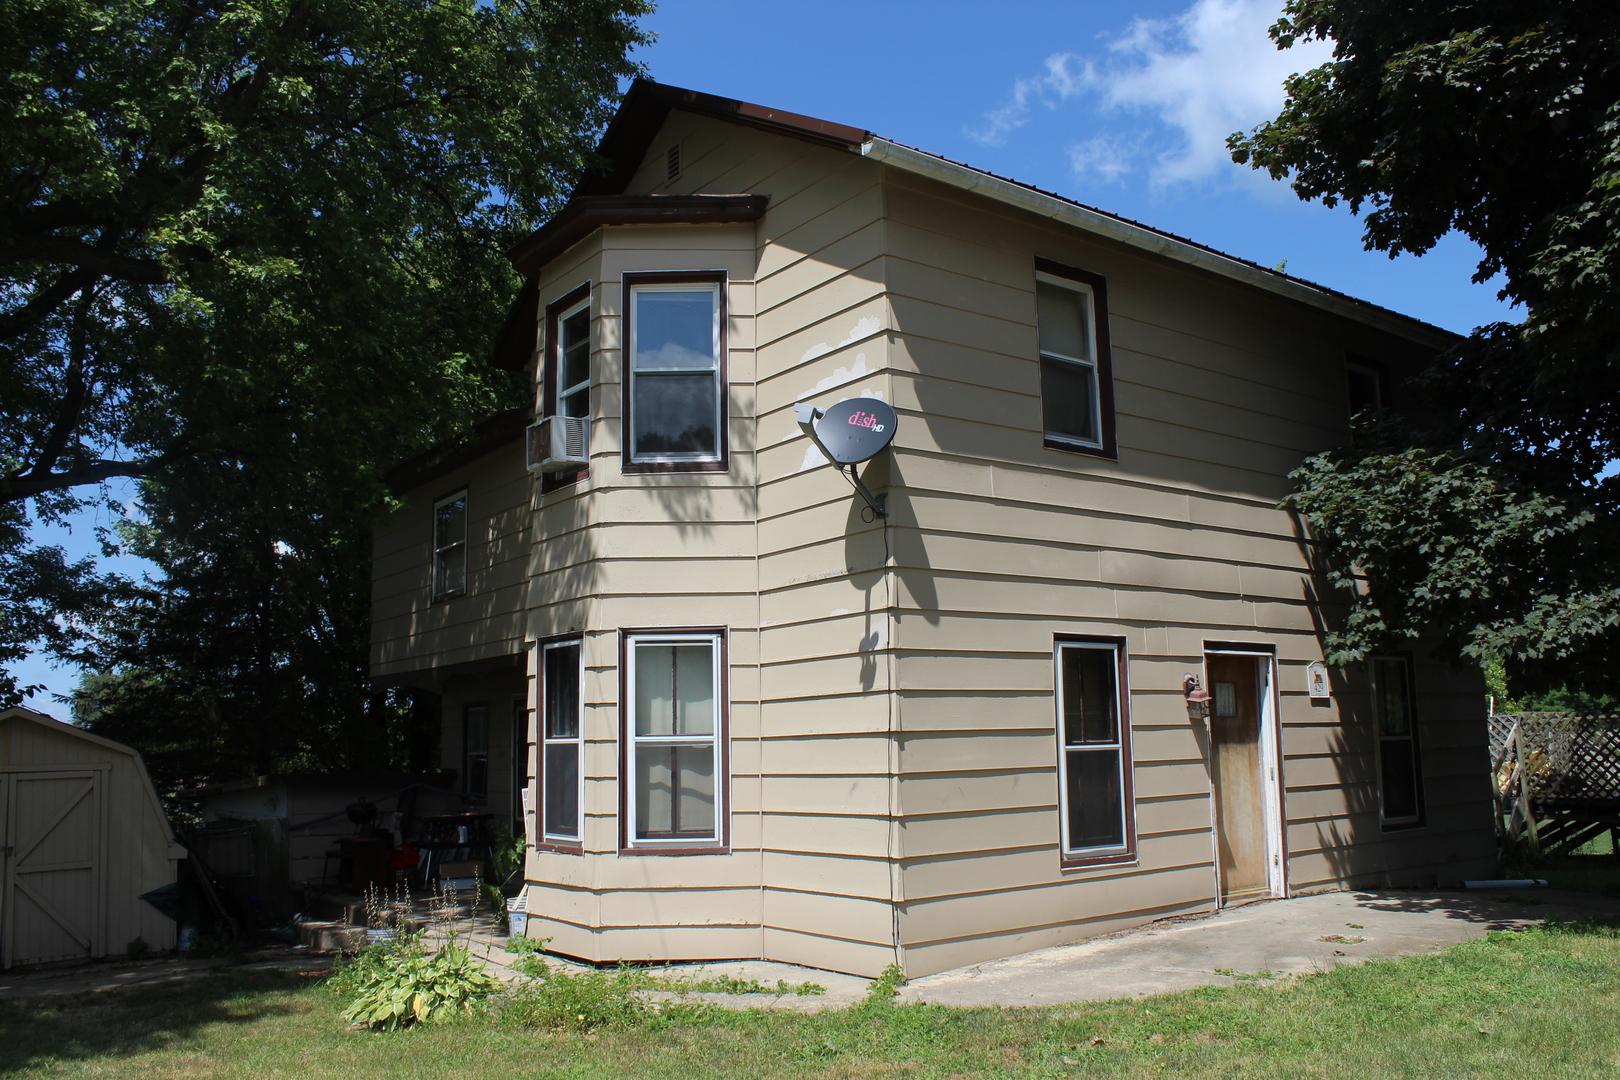 429 South Mill, Mount Carroll, Illinois, 61053